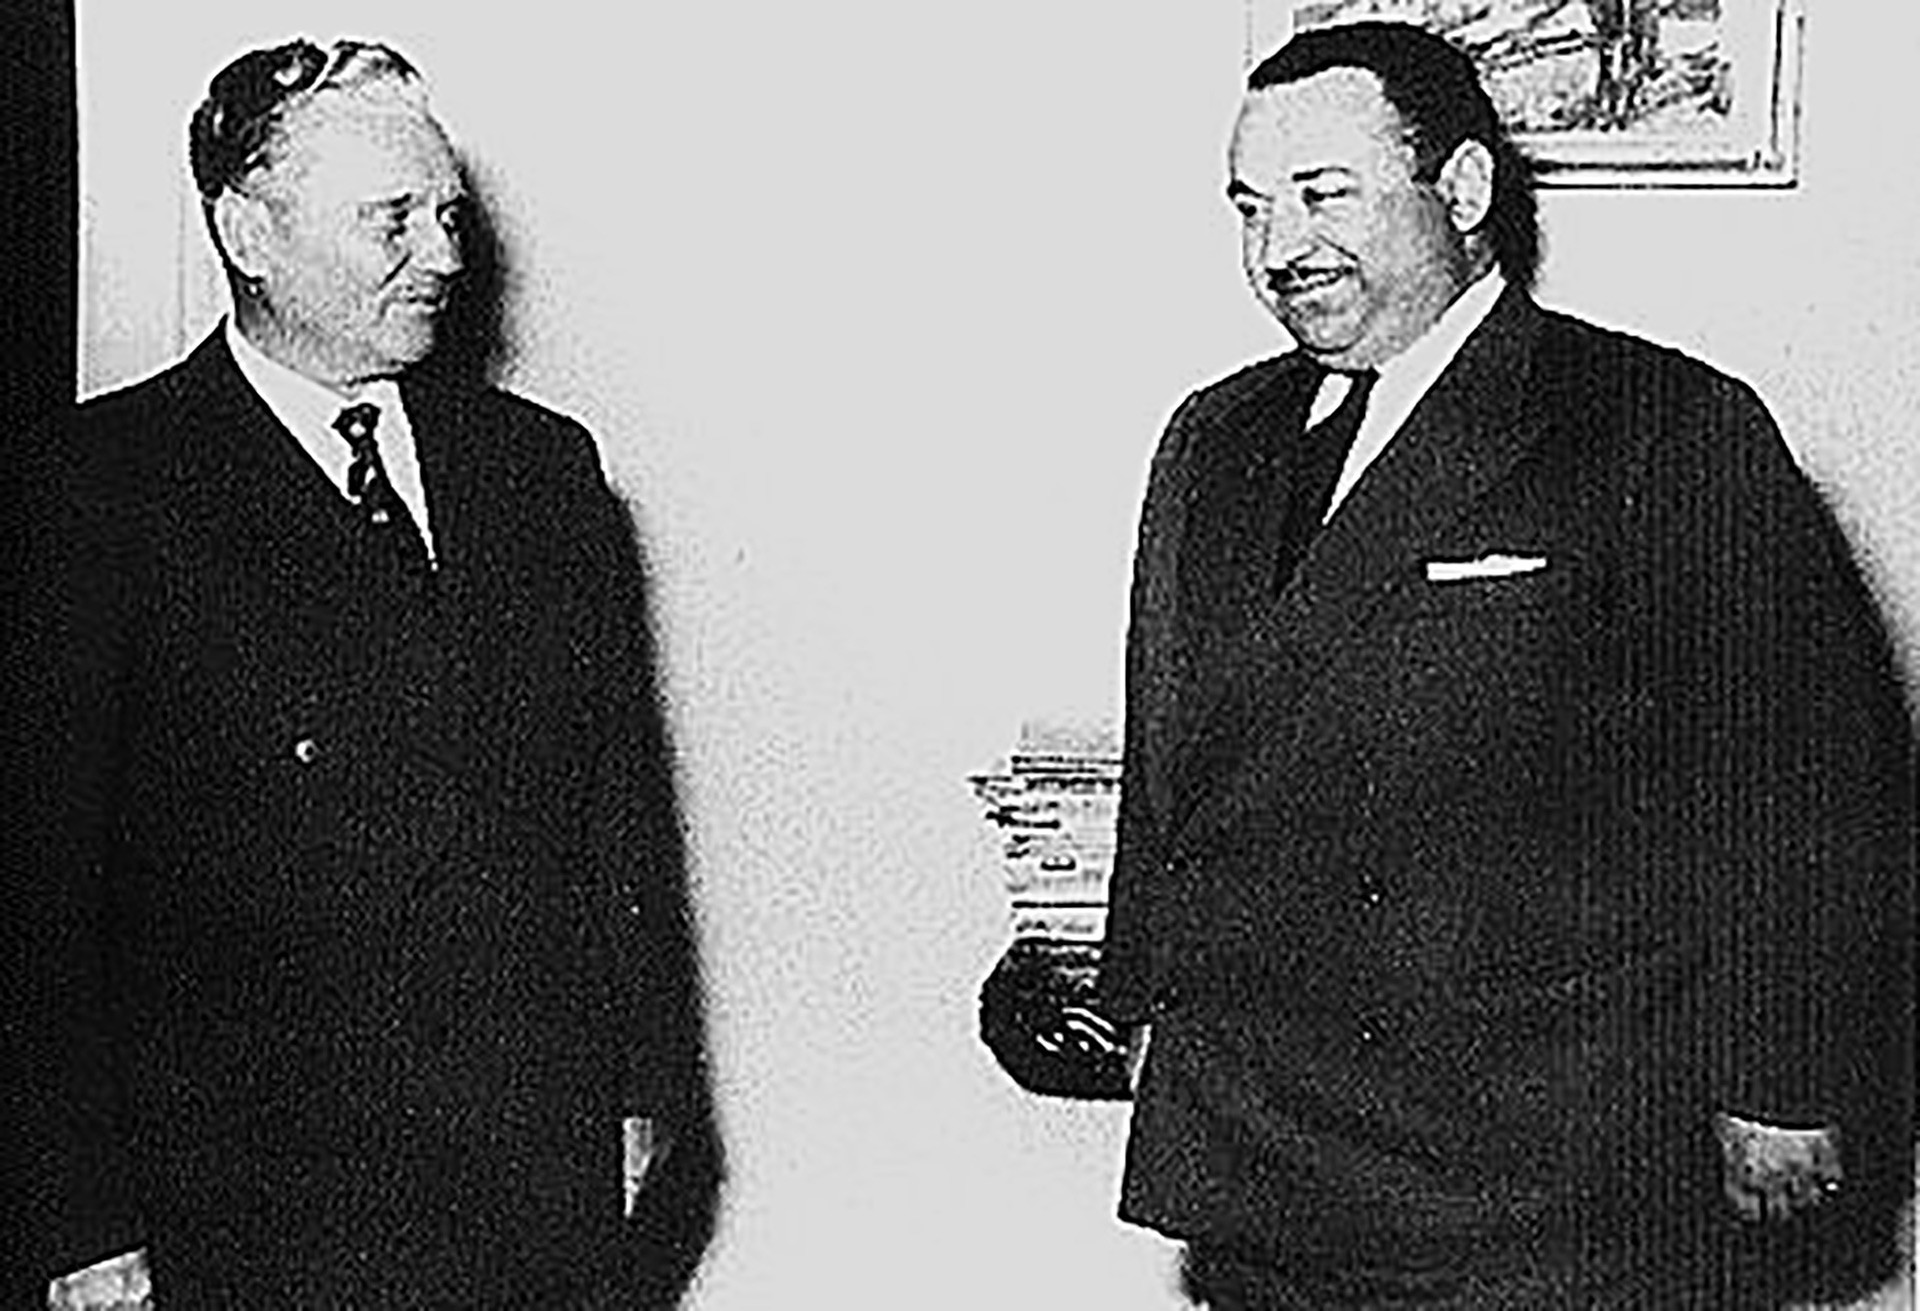 Foto Josip Broz Tito dengan Iosif Grigulevich (kanan)